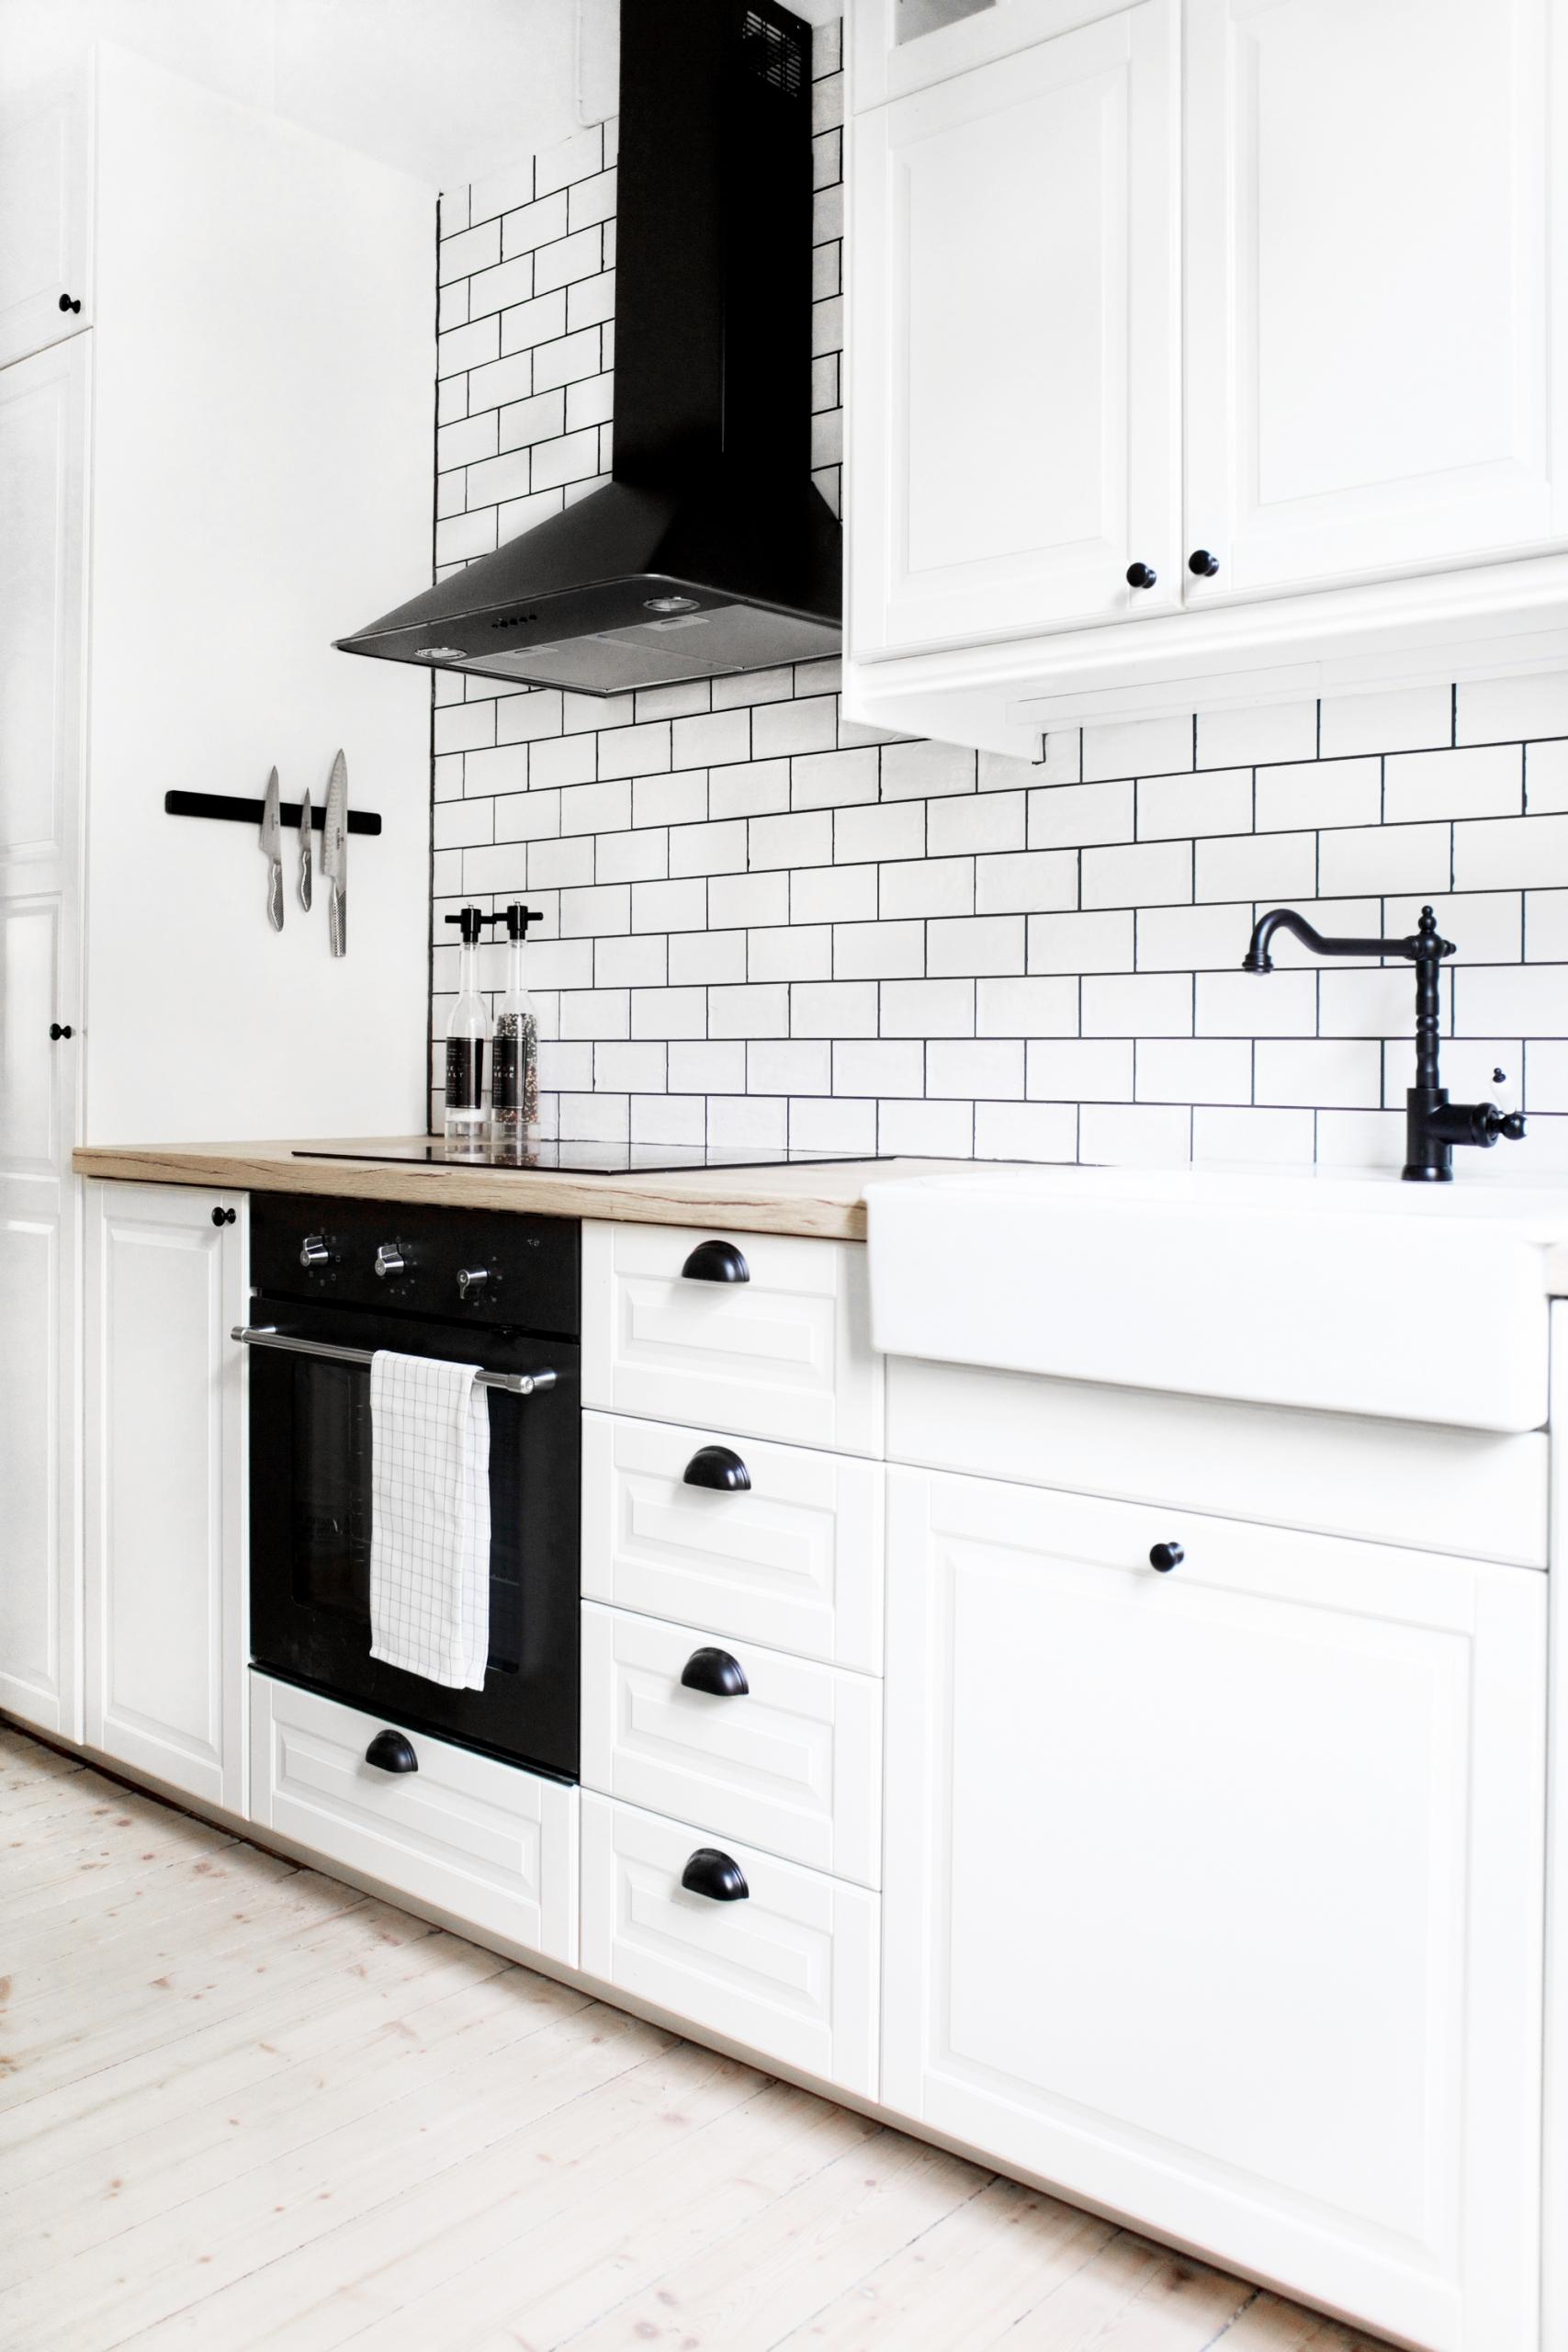 Kitchen de Victoria Tornegren